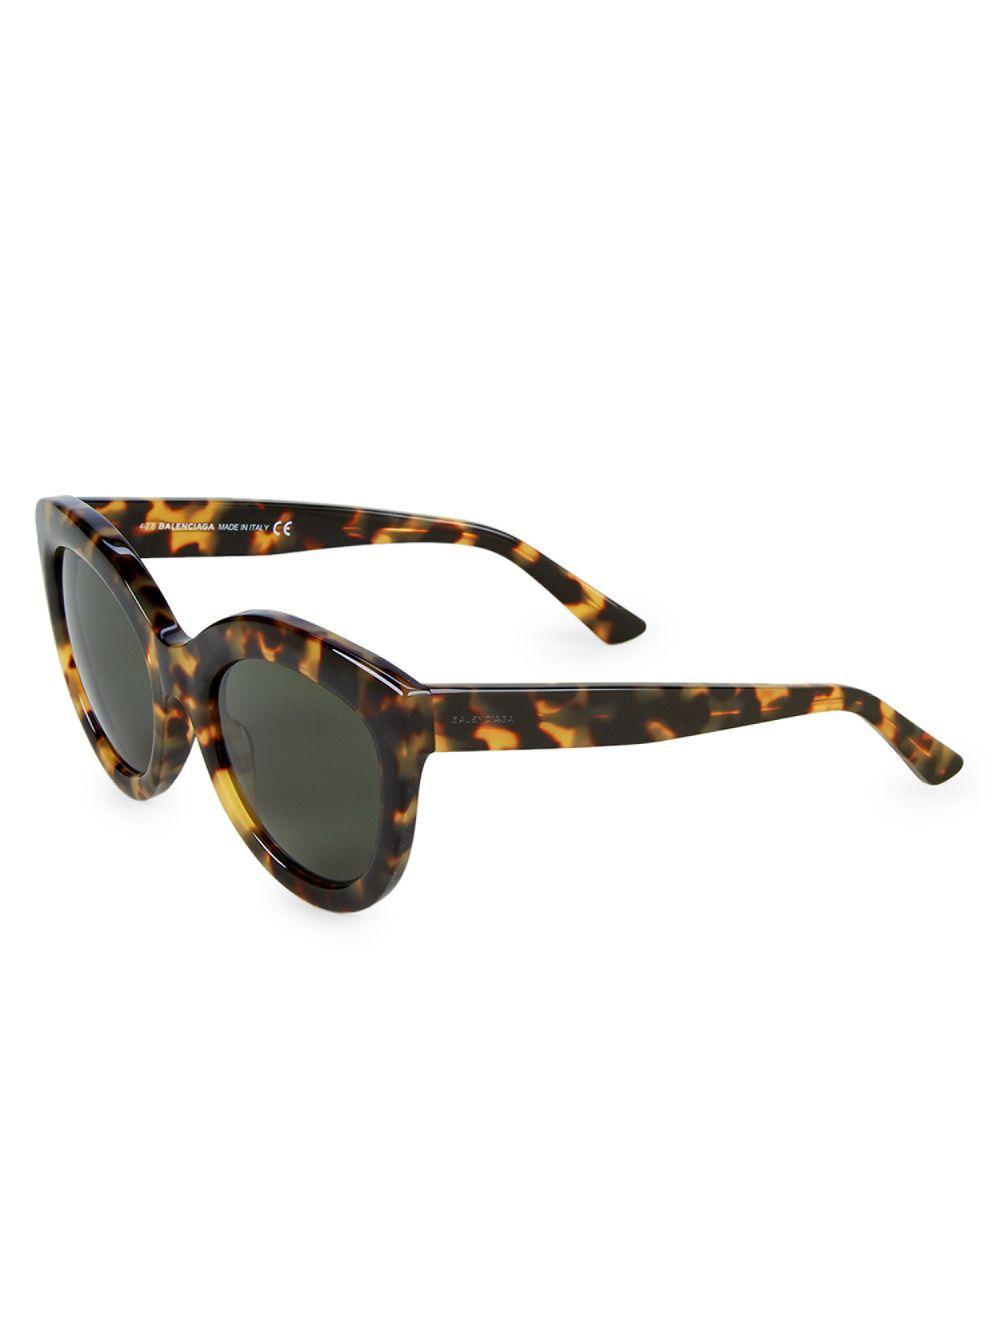 b14786347c Lyst - Balenciaga 54mm Cat Eye Sunglasses in Brown